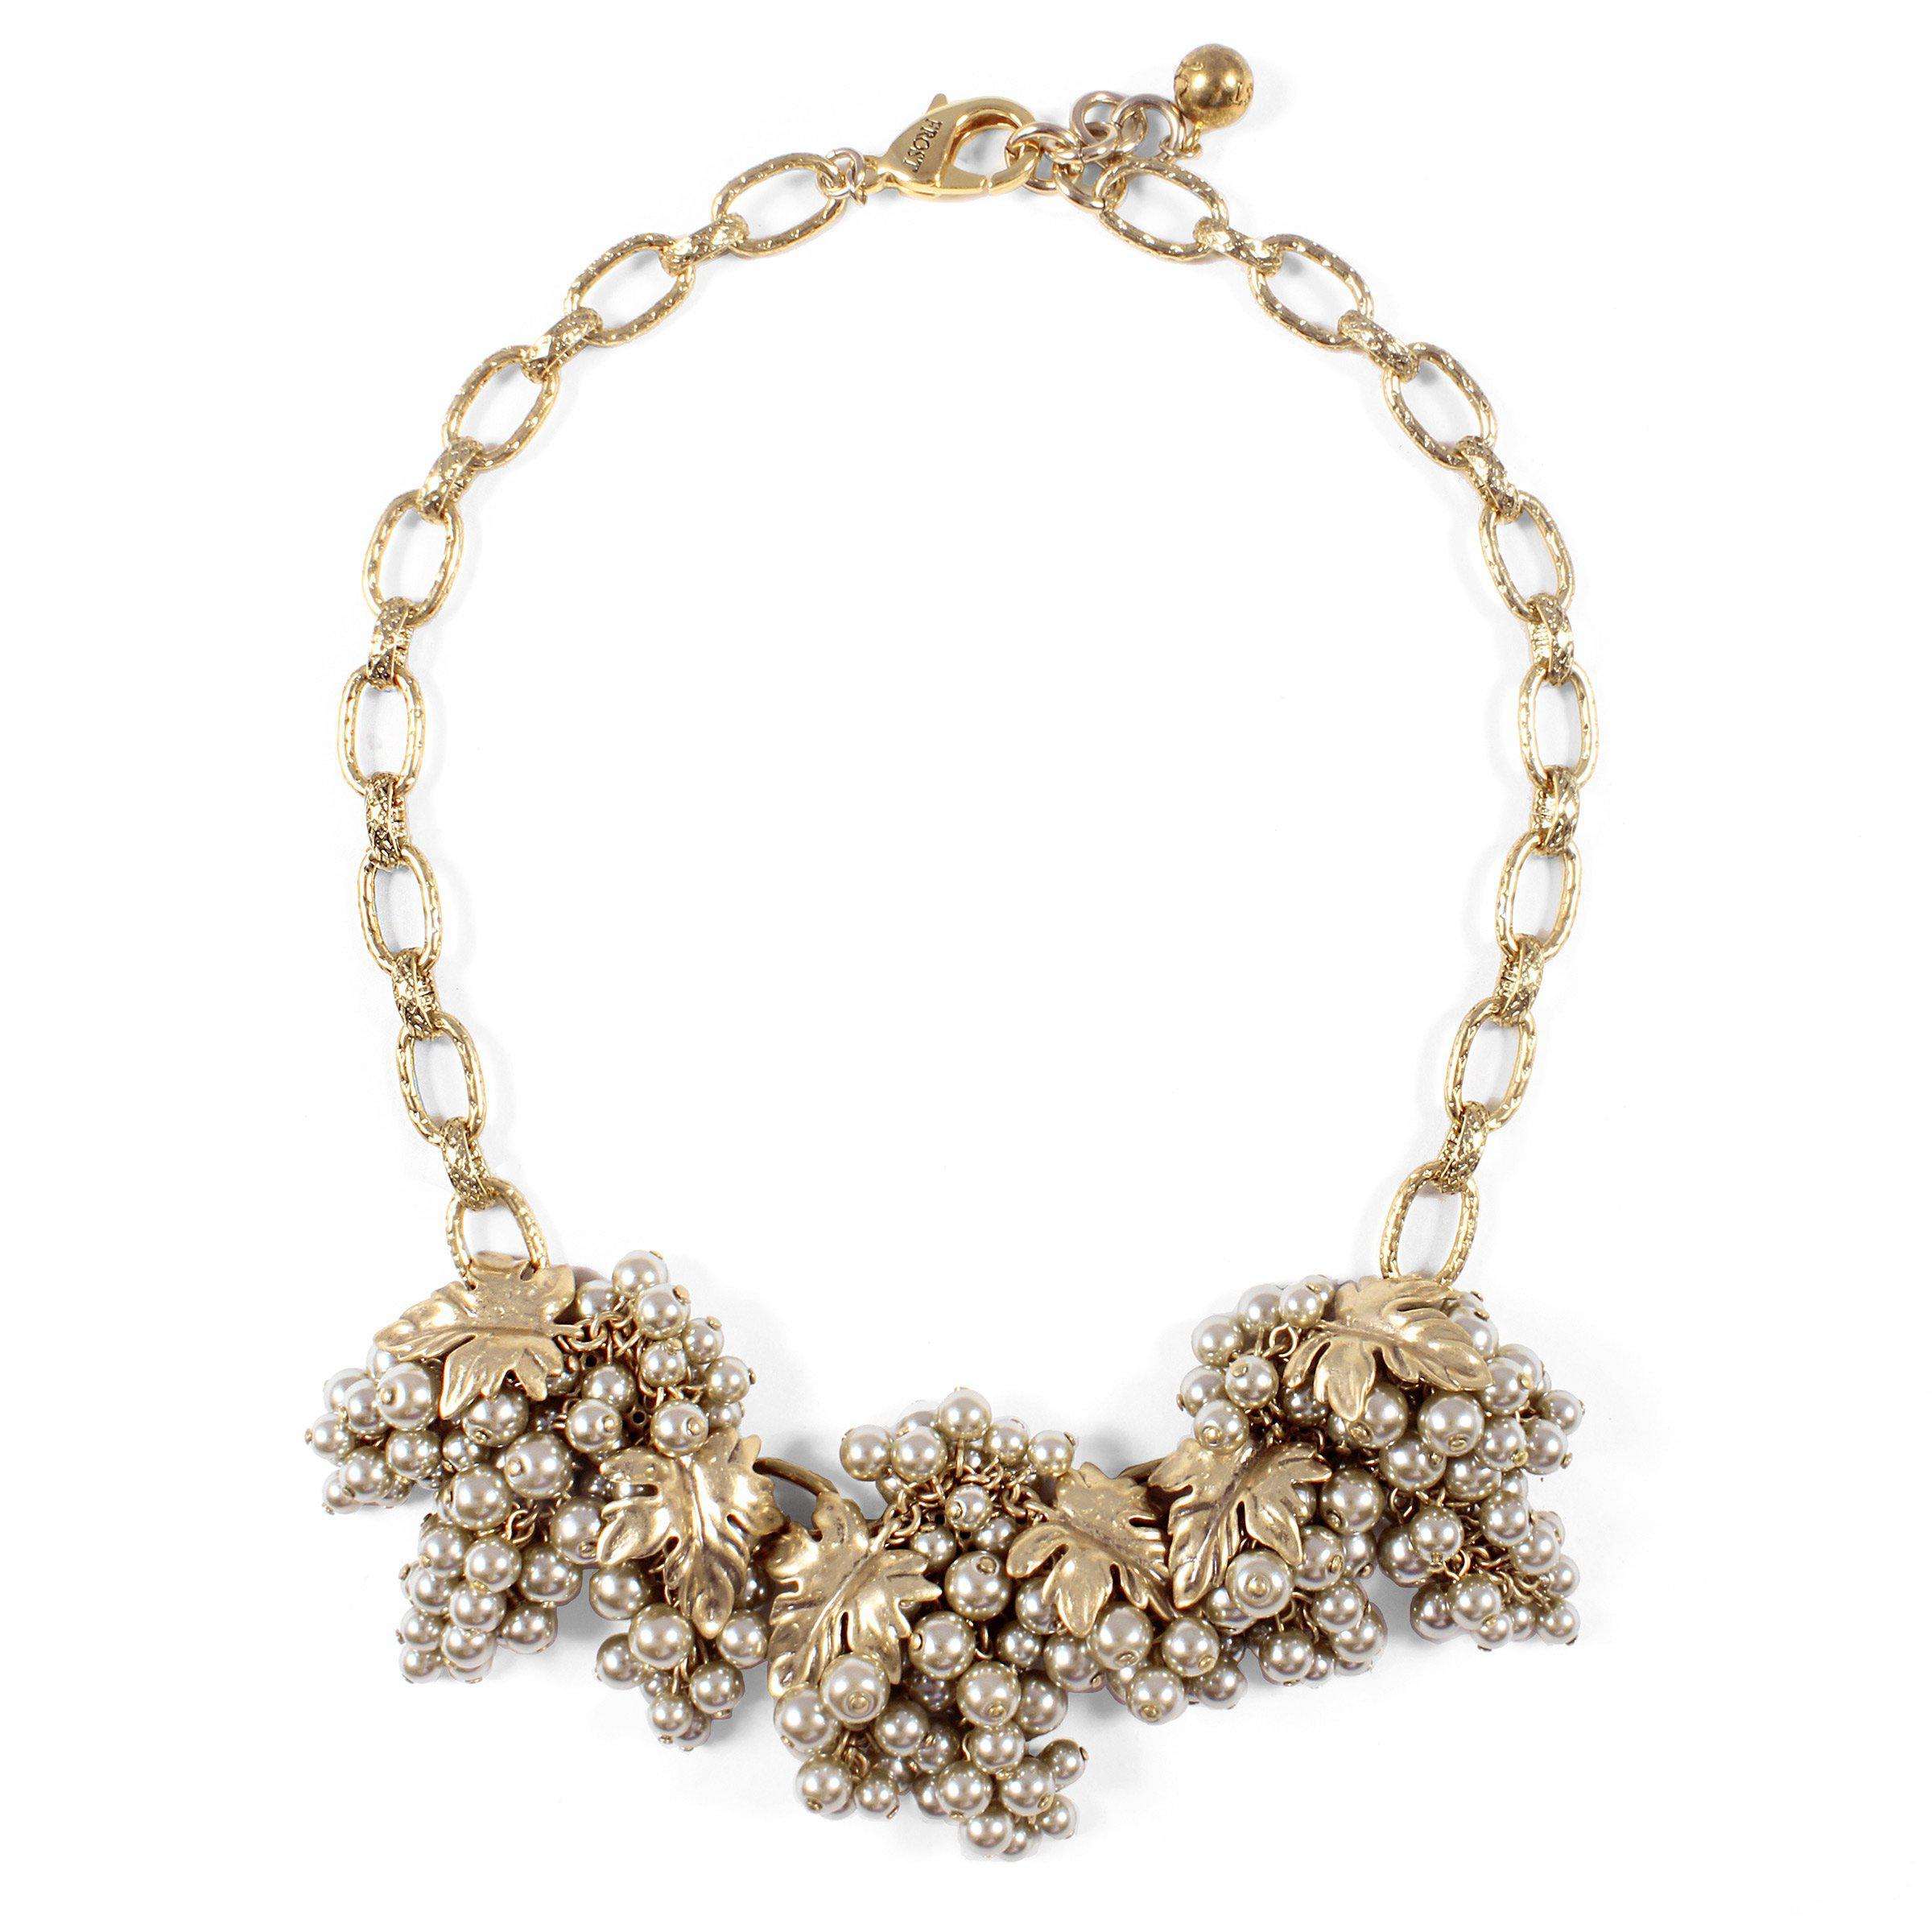 Matira Statement Gold-Plated Brass Necklace Lulu Frost mFnhp9SV